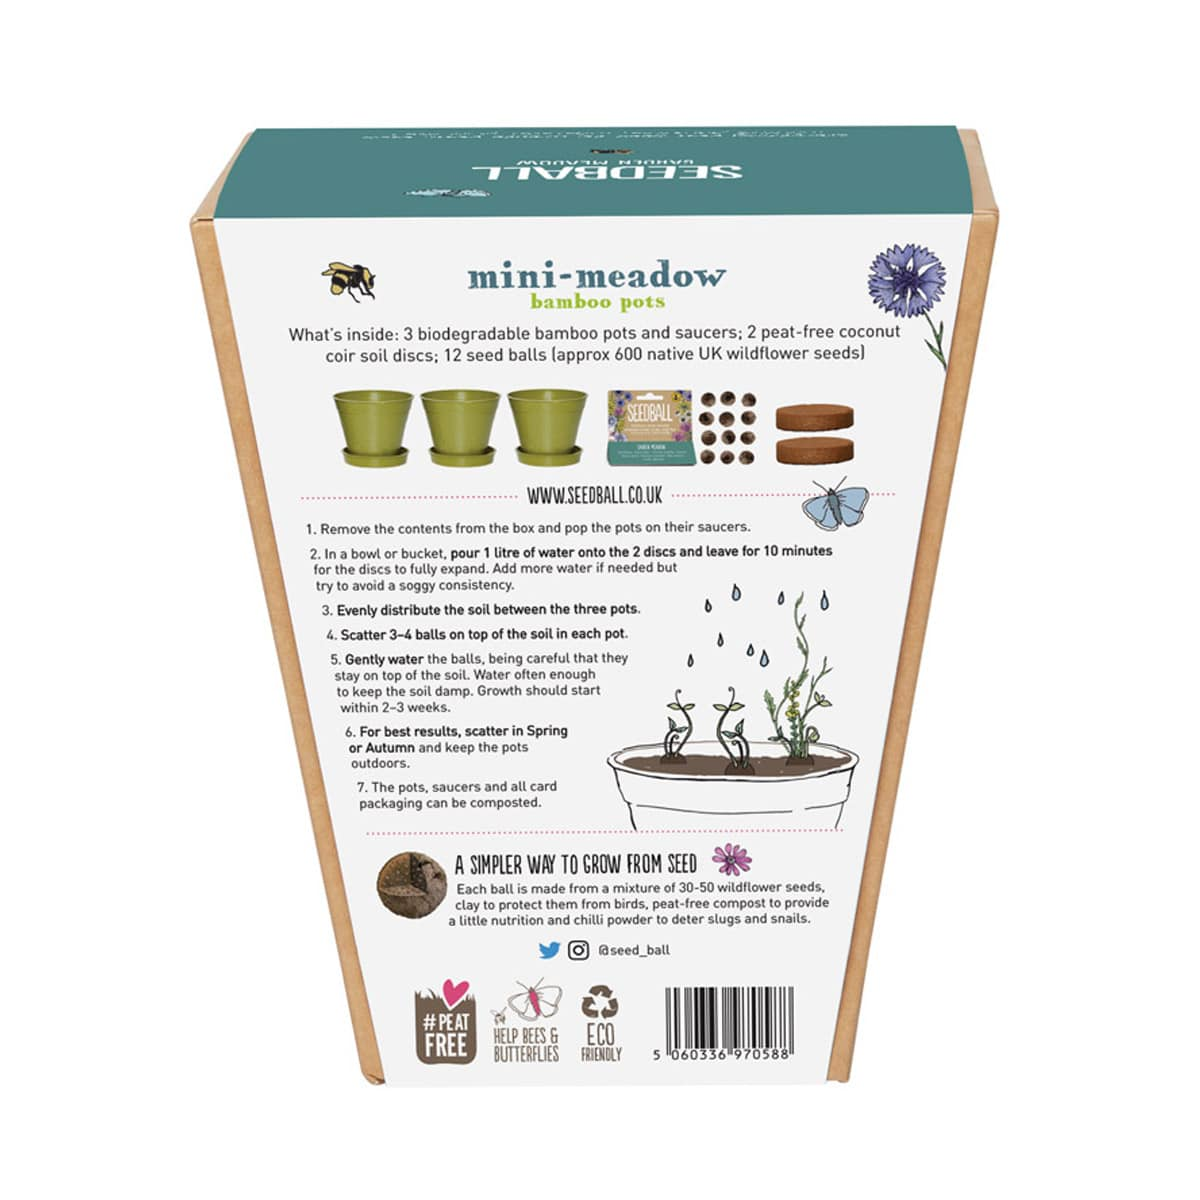 Mini Meadow Seedball Butterfly Mix by Seedball | Restoration Yard